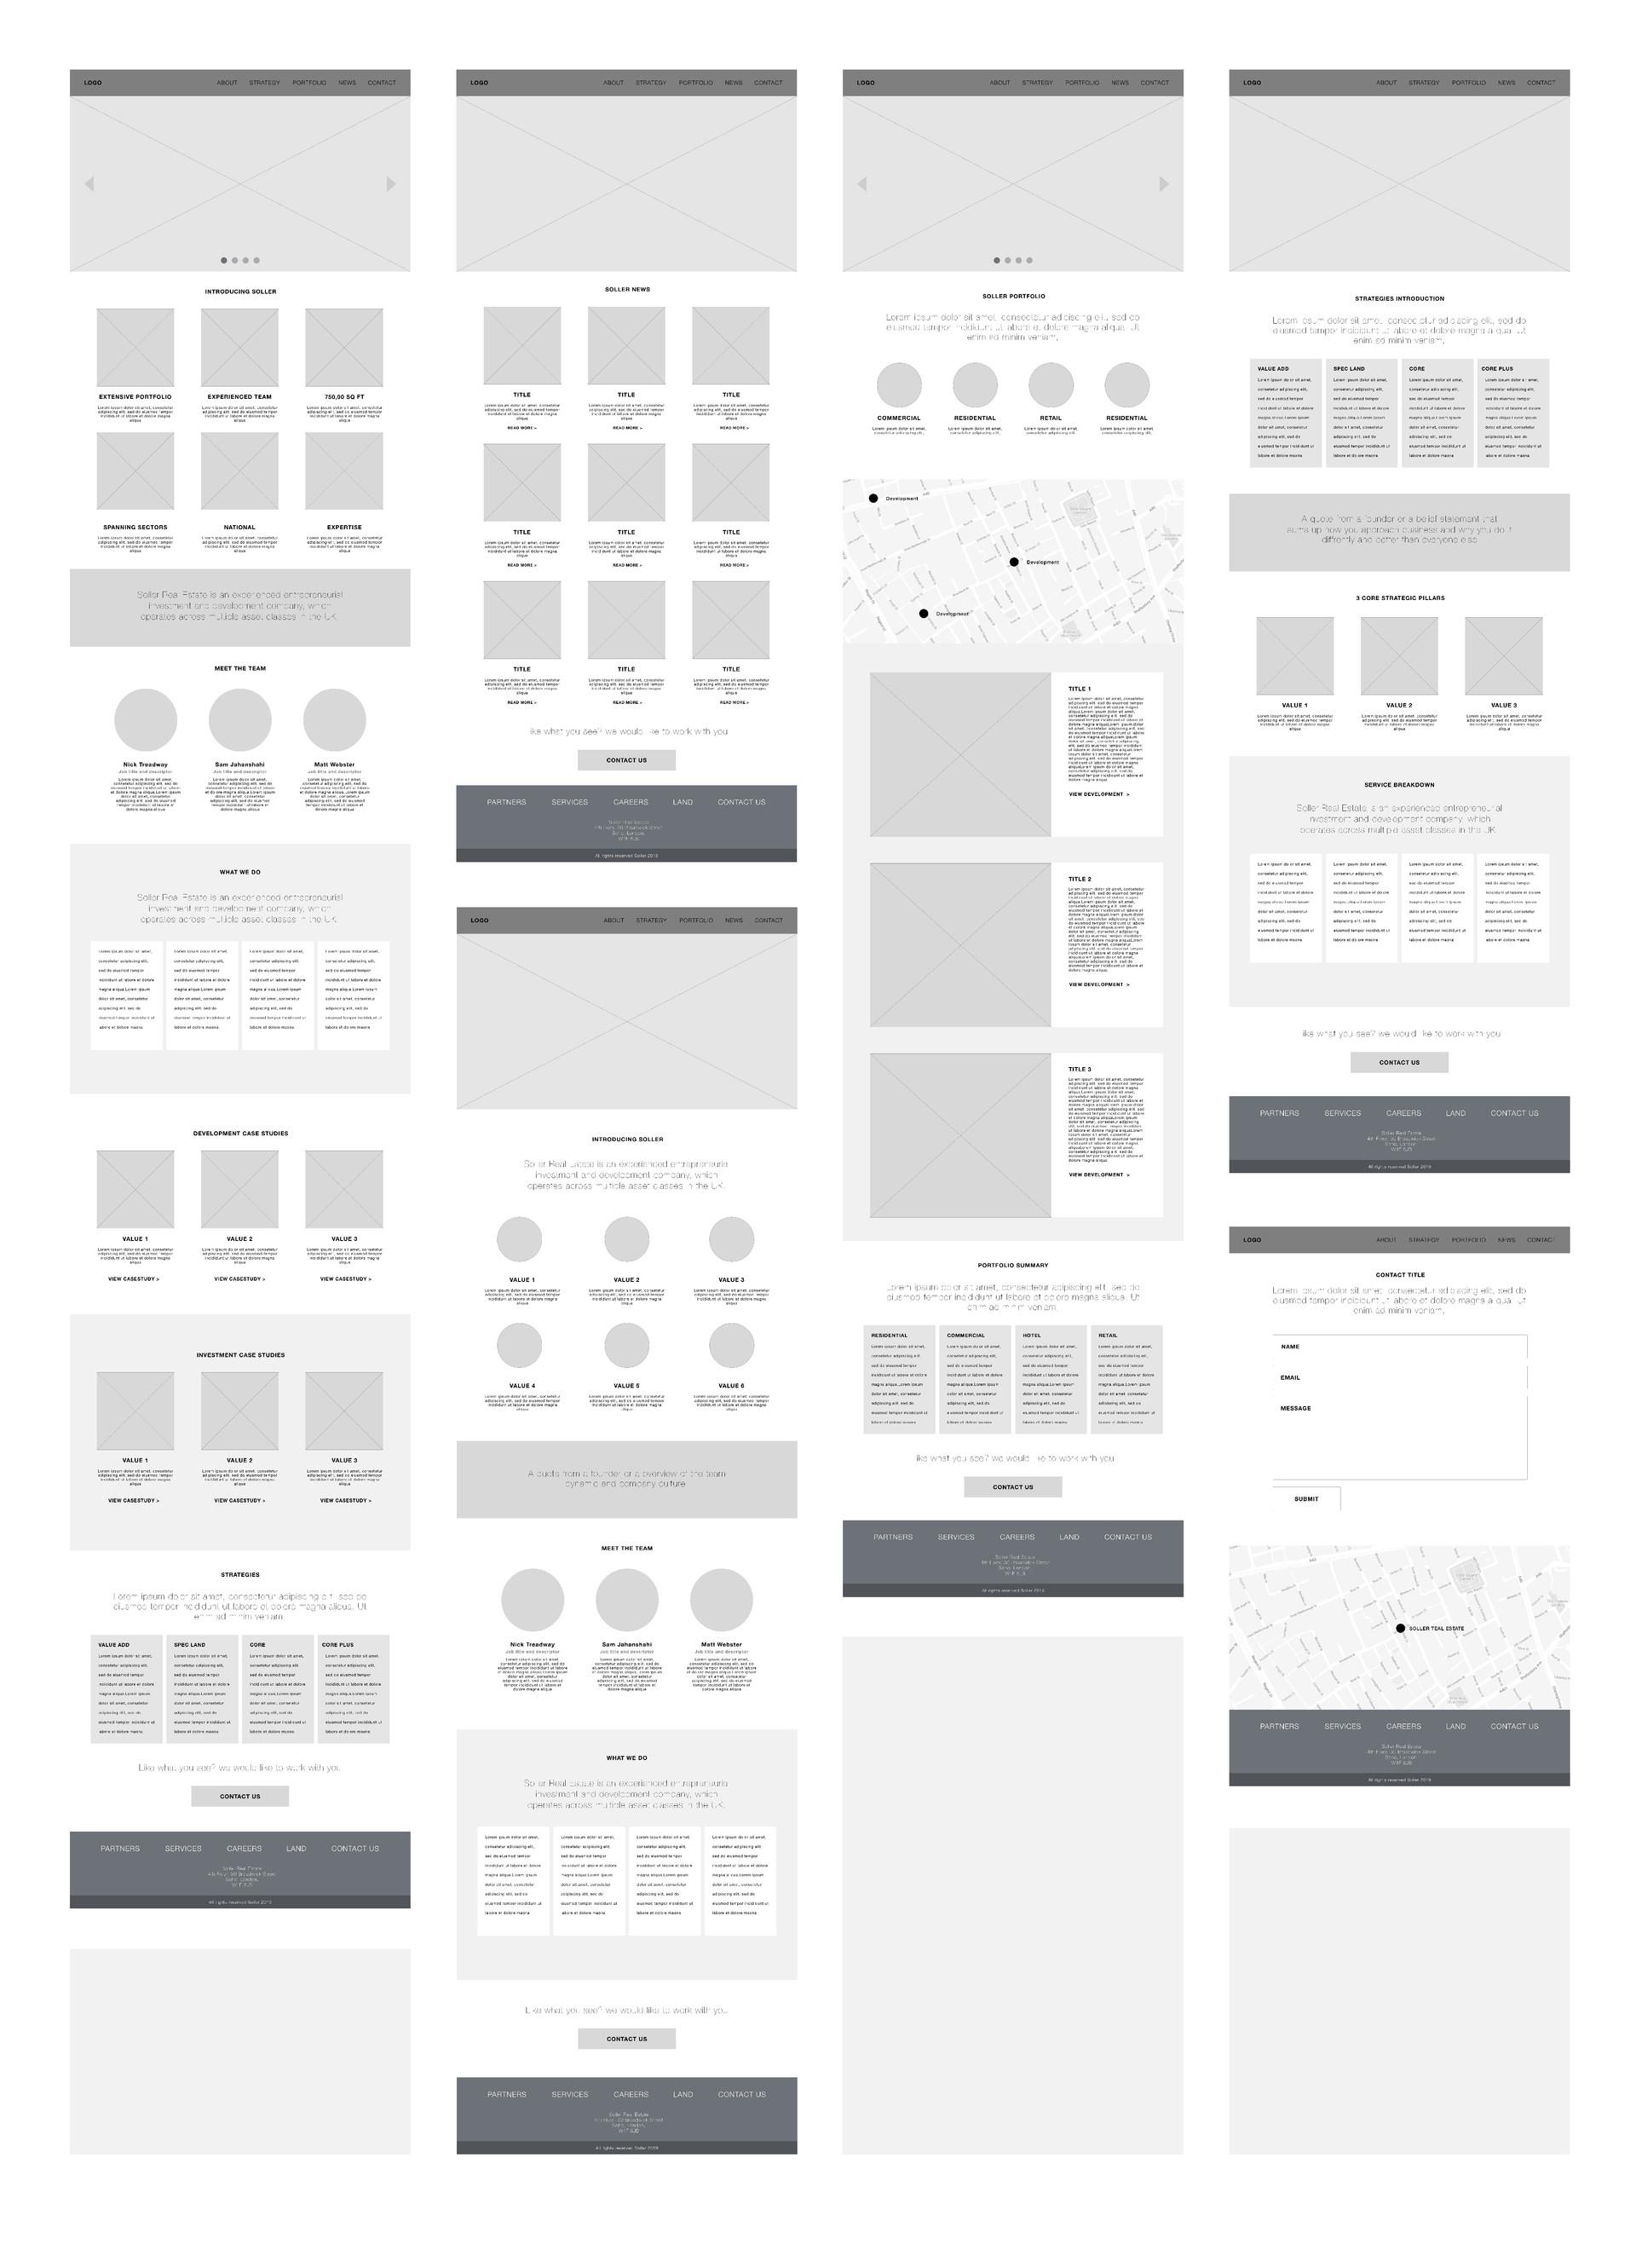 Soller Casesudy Assets copy-02.jpg